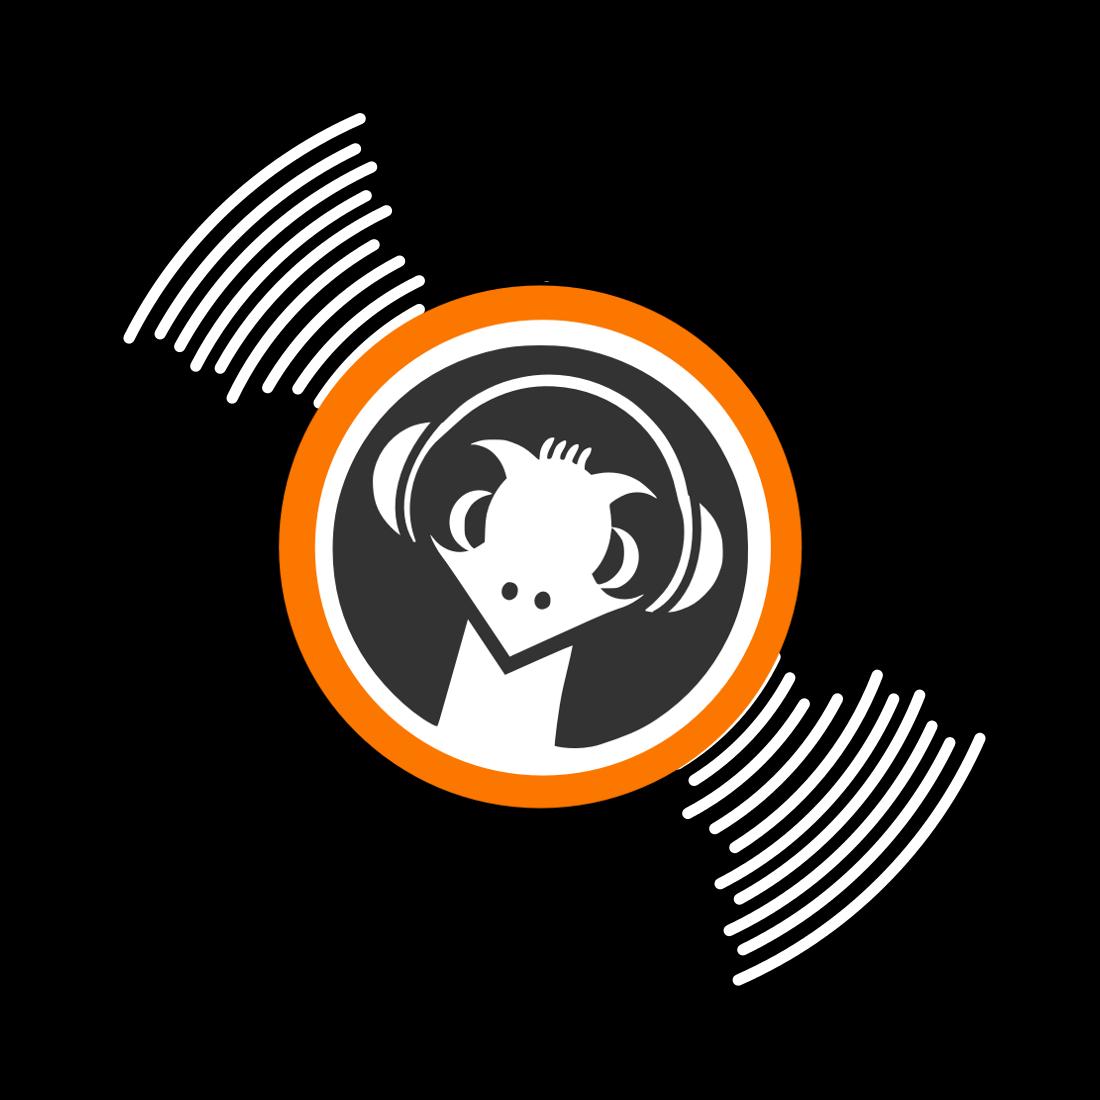 [Mox aka Funny Dead Thing] Tundra EP [ADR.COM042]